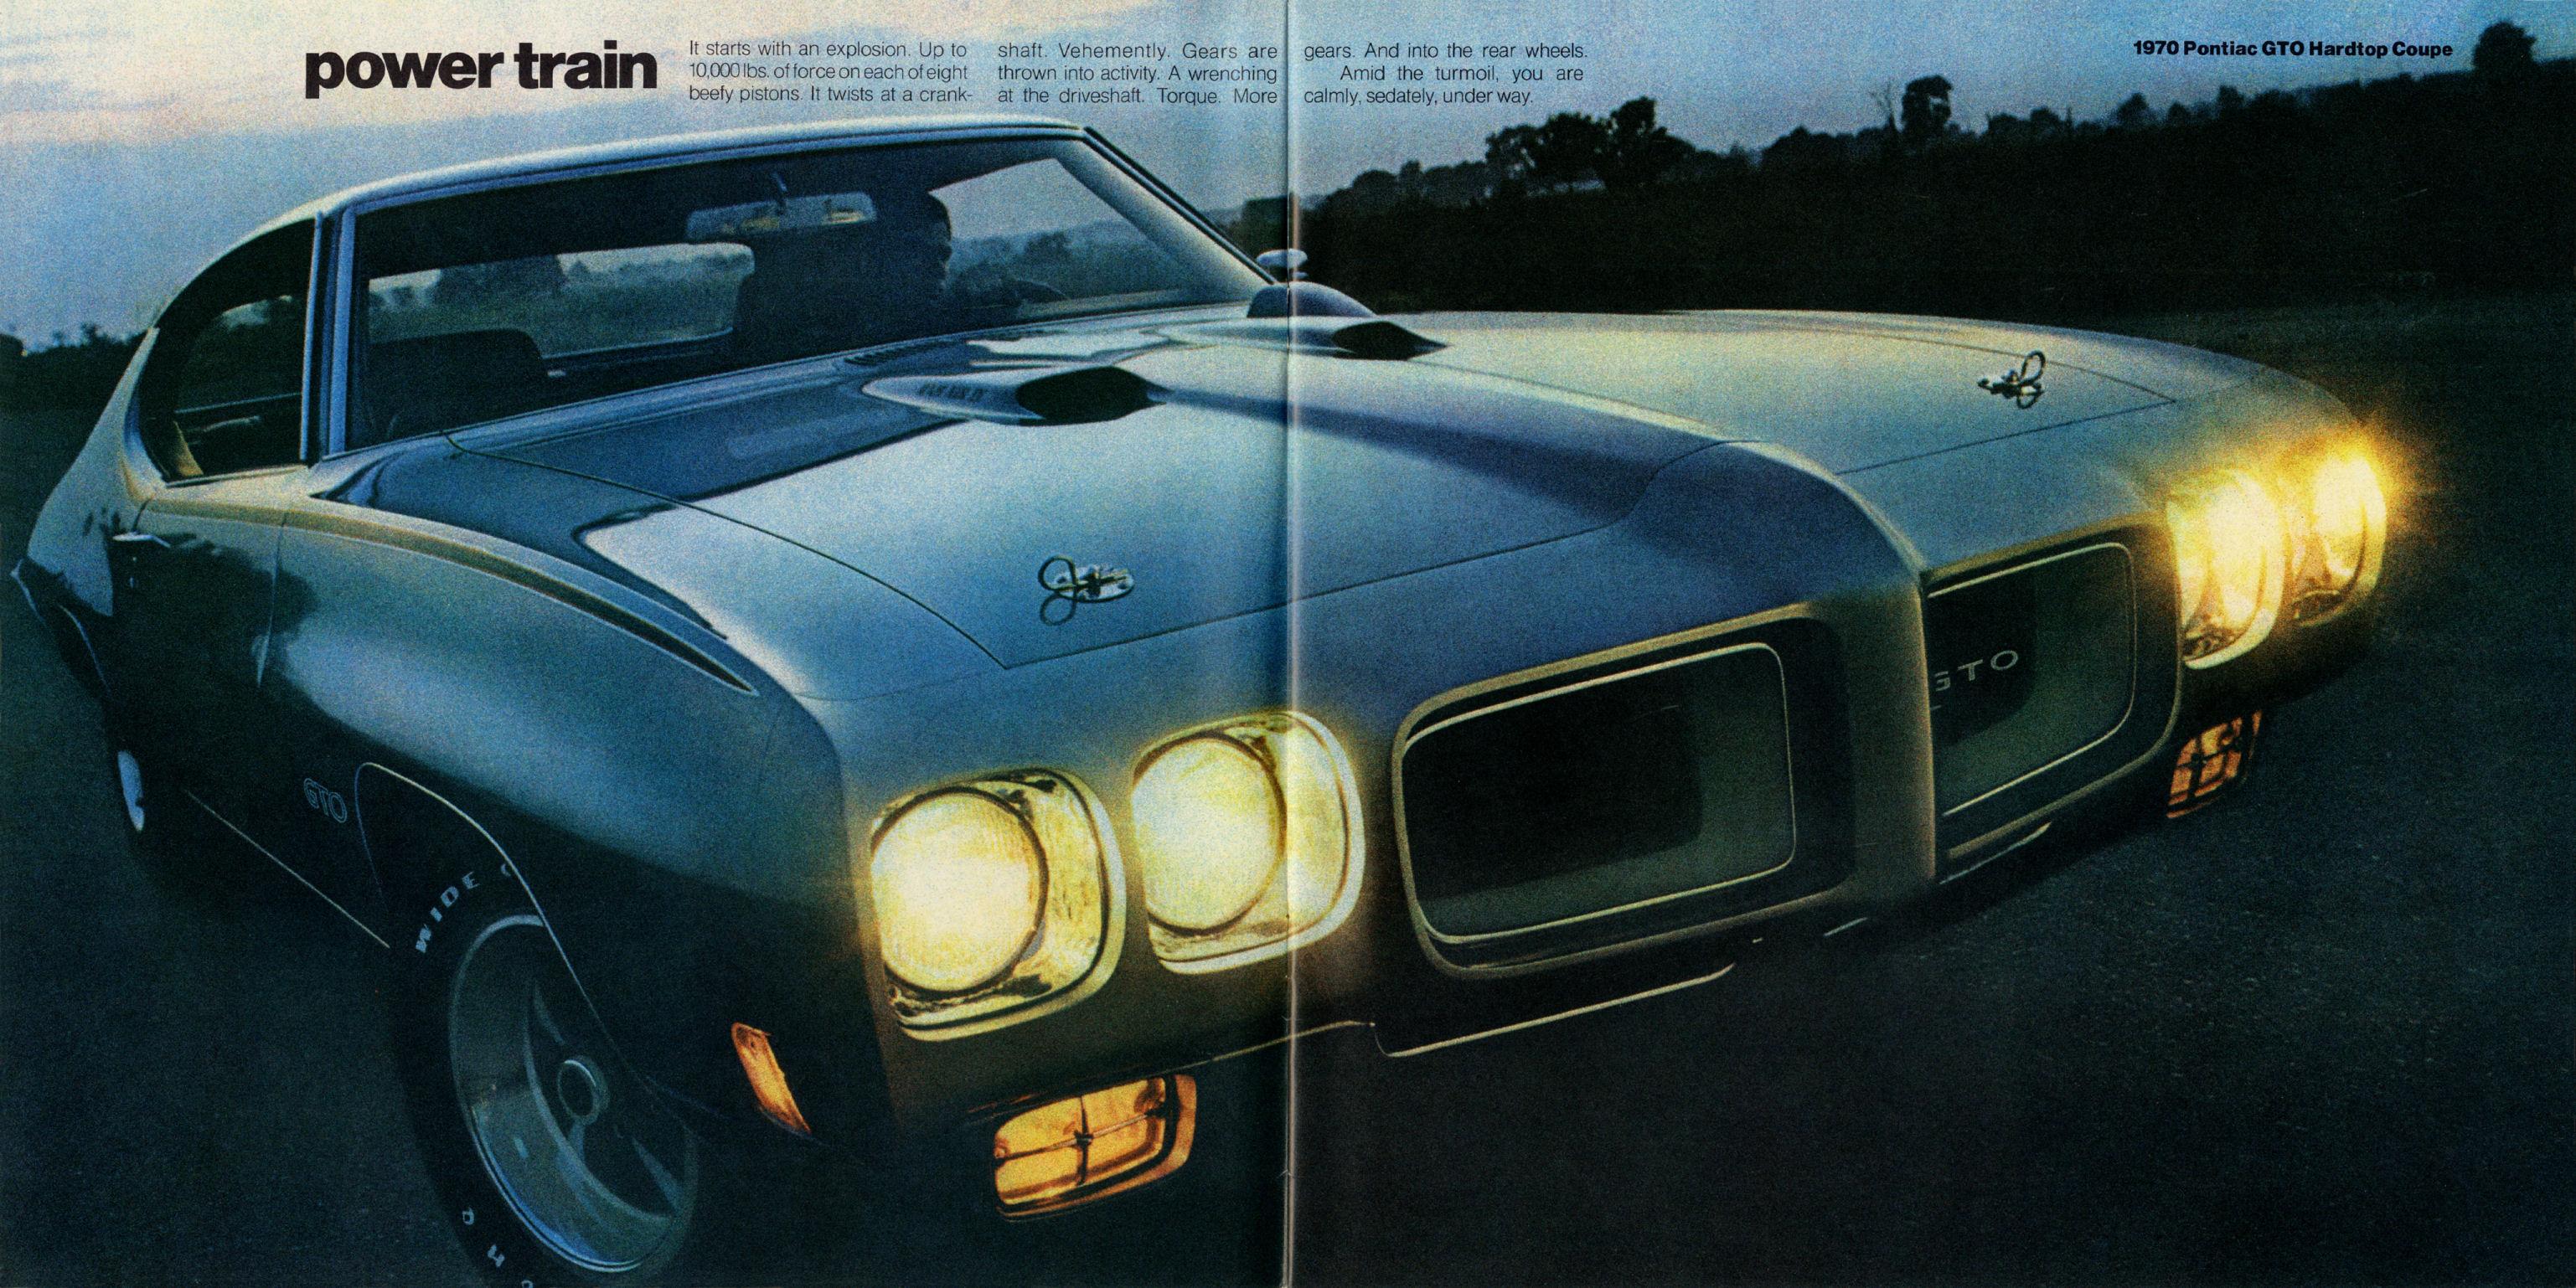 1970%20Pontiac%20Performance-04-05.jpg